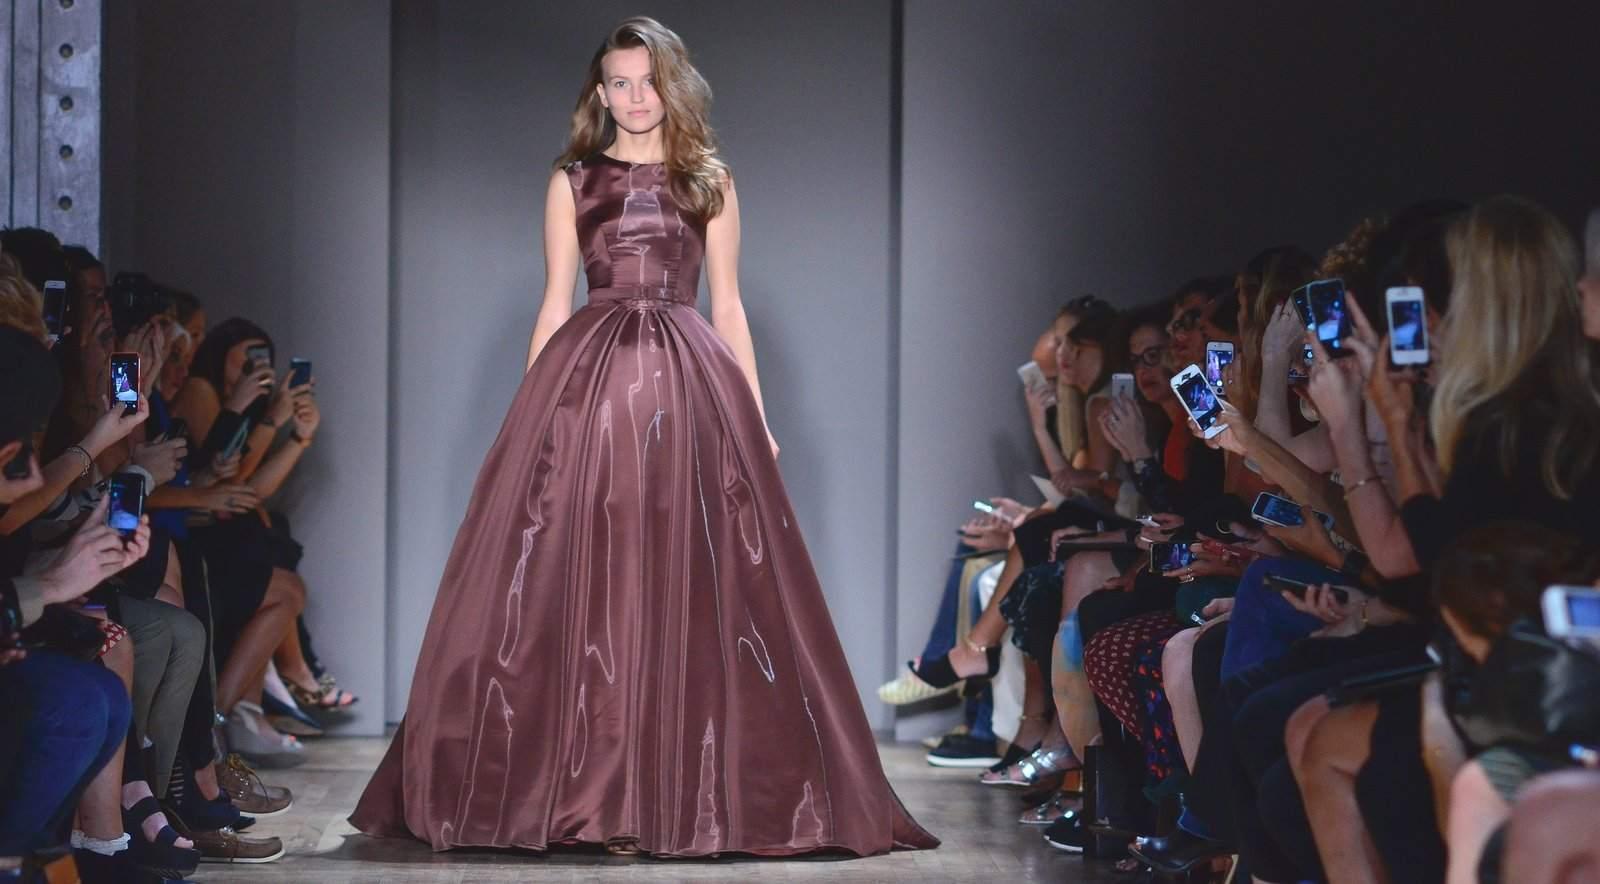 jenny packham5 Jenny Packham Spring/Summer Collection 2015 at NYC Fashion Week